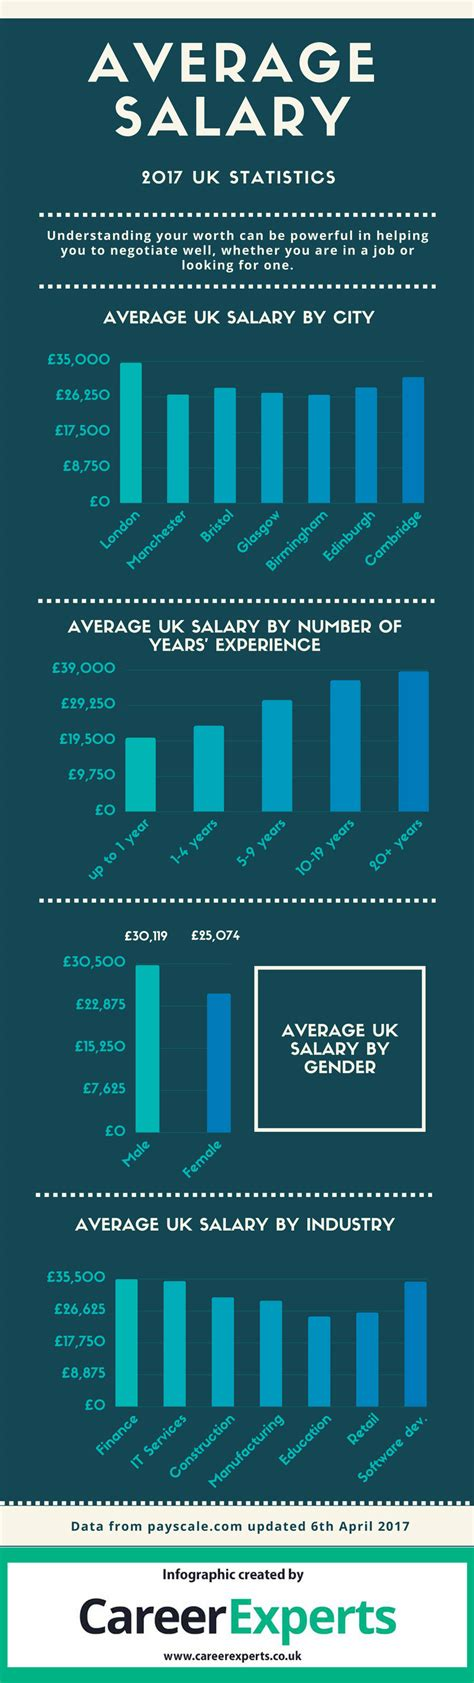 wages salaries infographic uk average salary statistics 2017